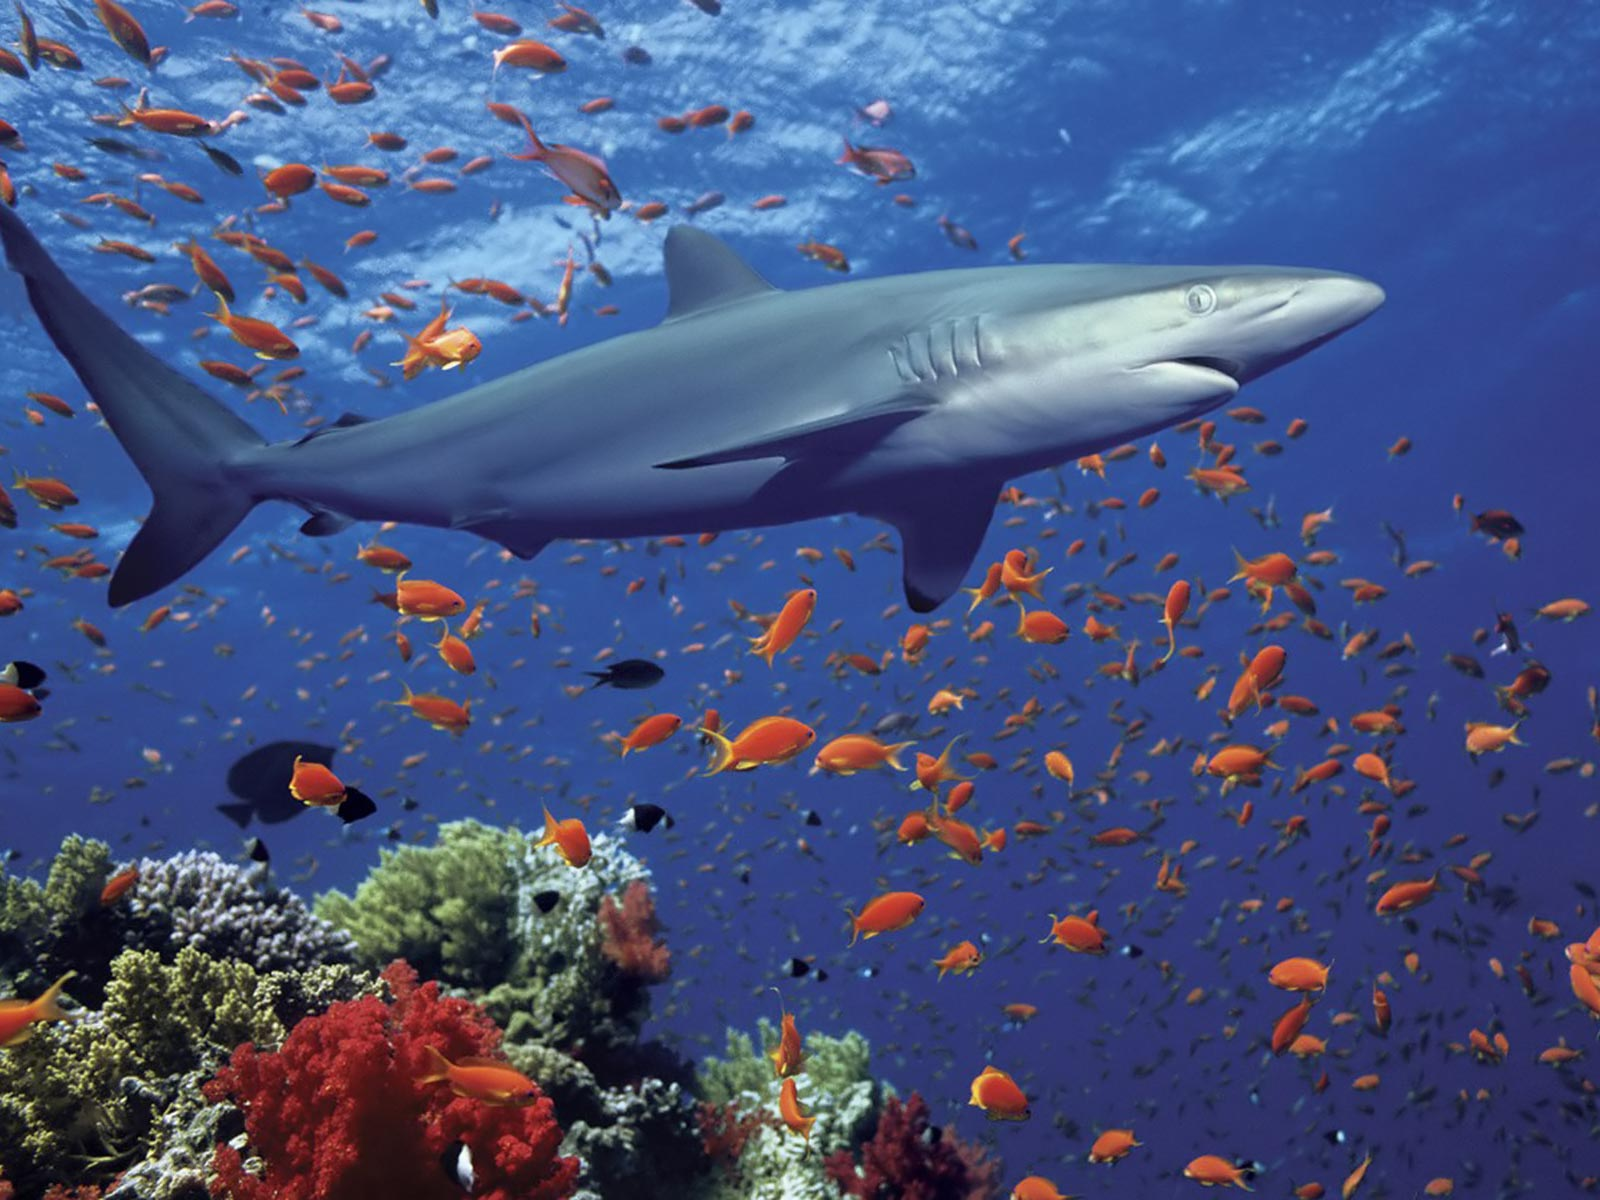 016 ryby - žralok